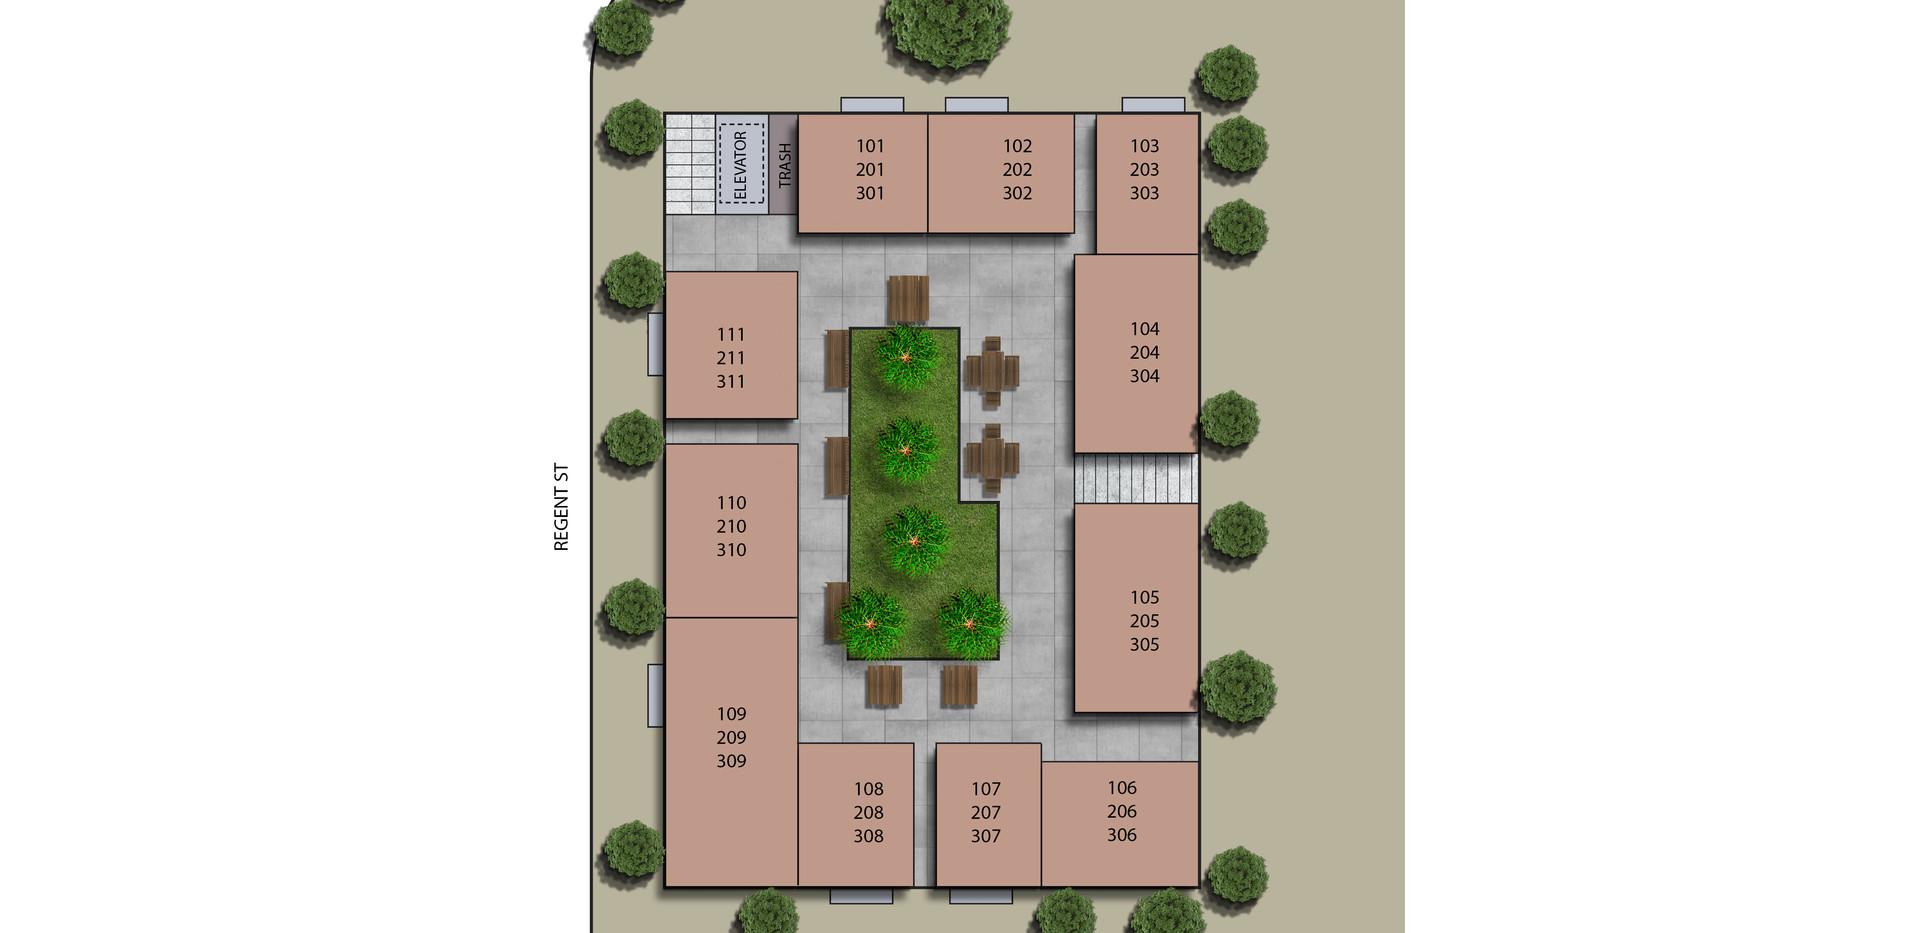 111RegentGardens-sitemap.jpg